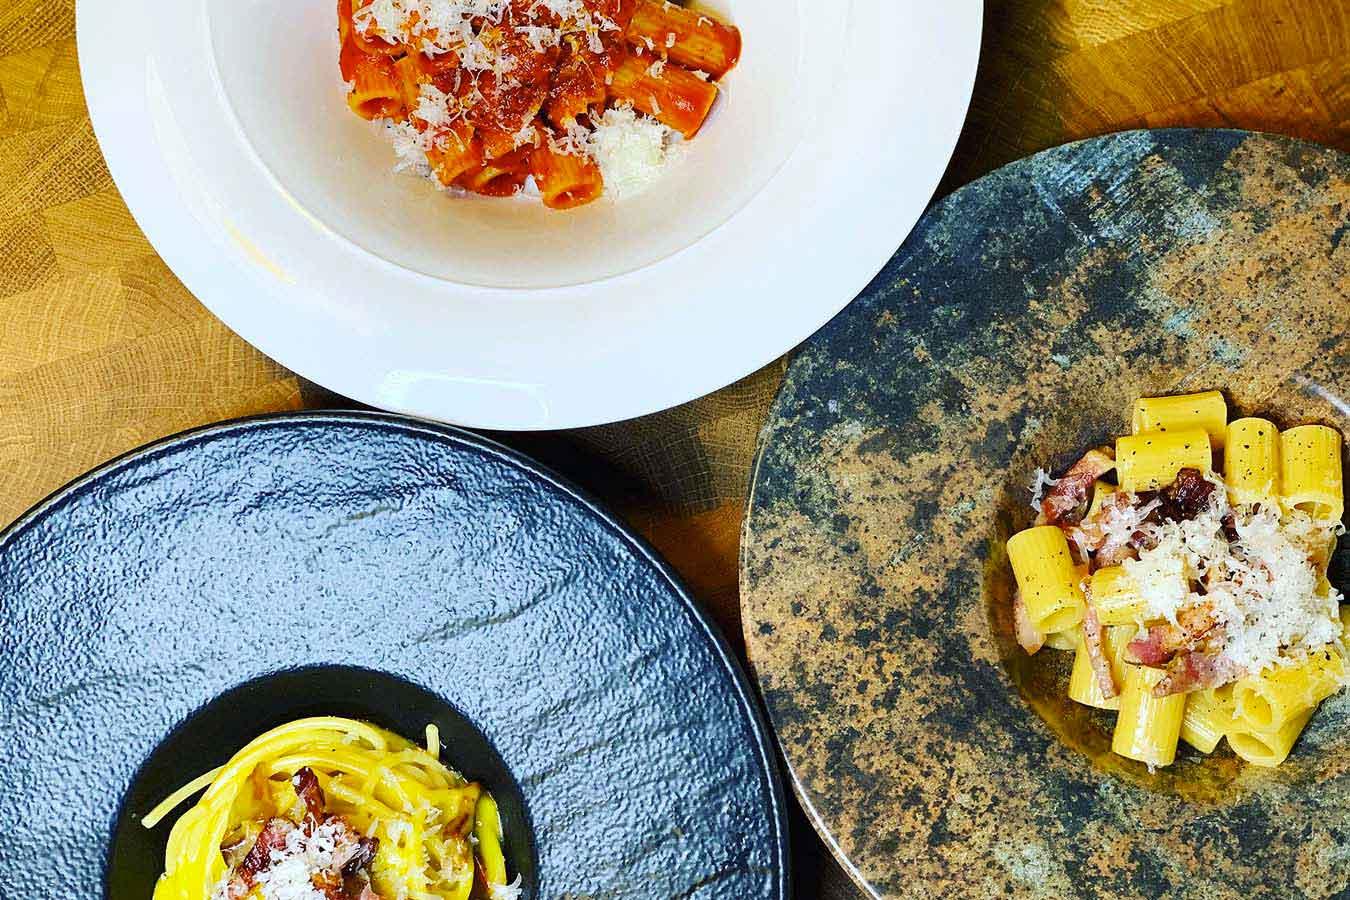 Pasta, le Fab Four della cucina romana: Cacio e Pepe, Carbonara, Gricia, Amatriciana